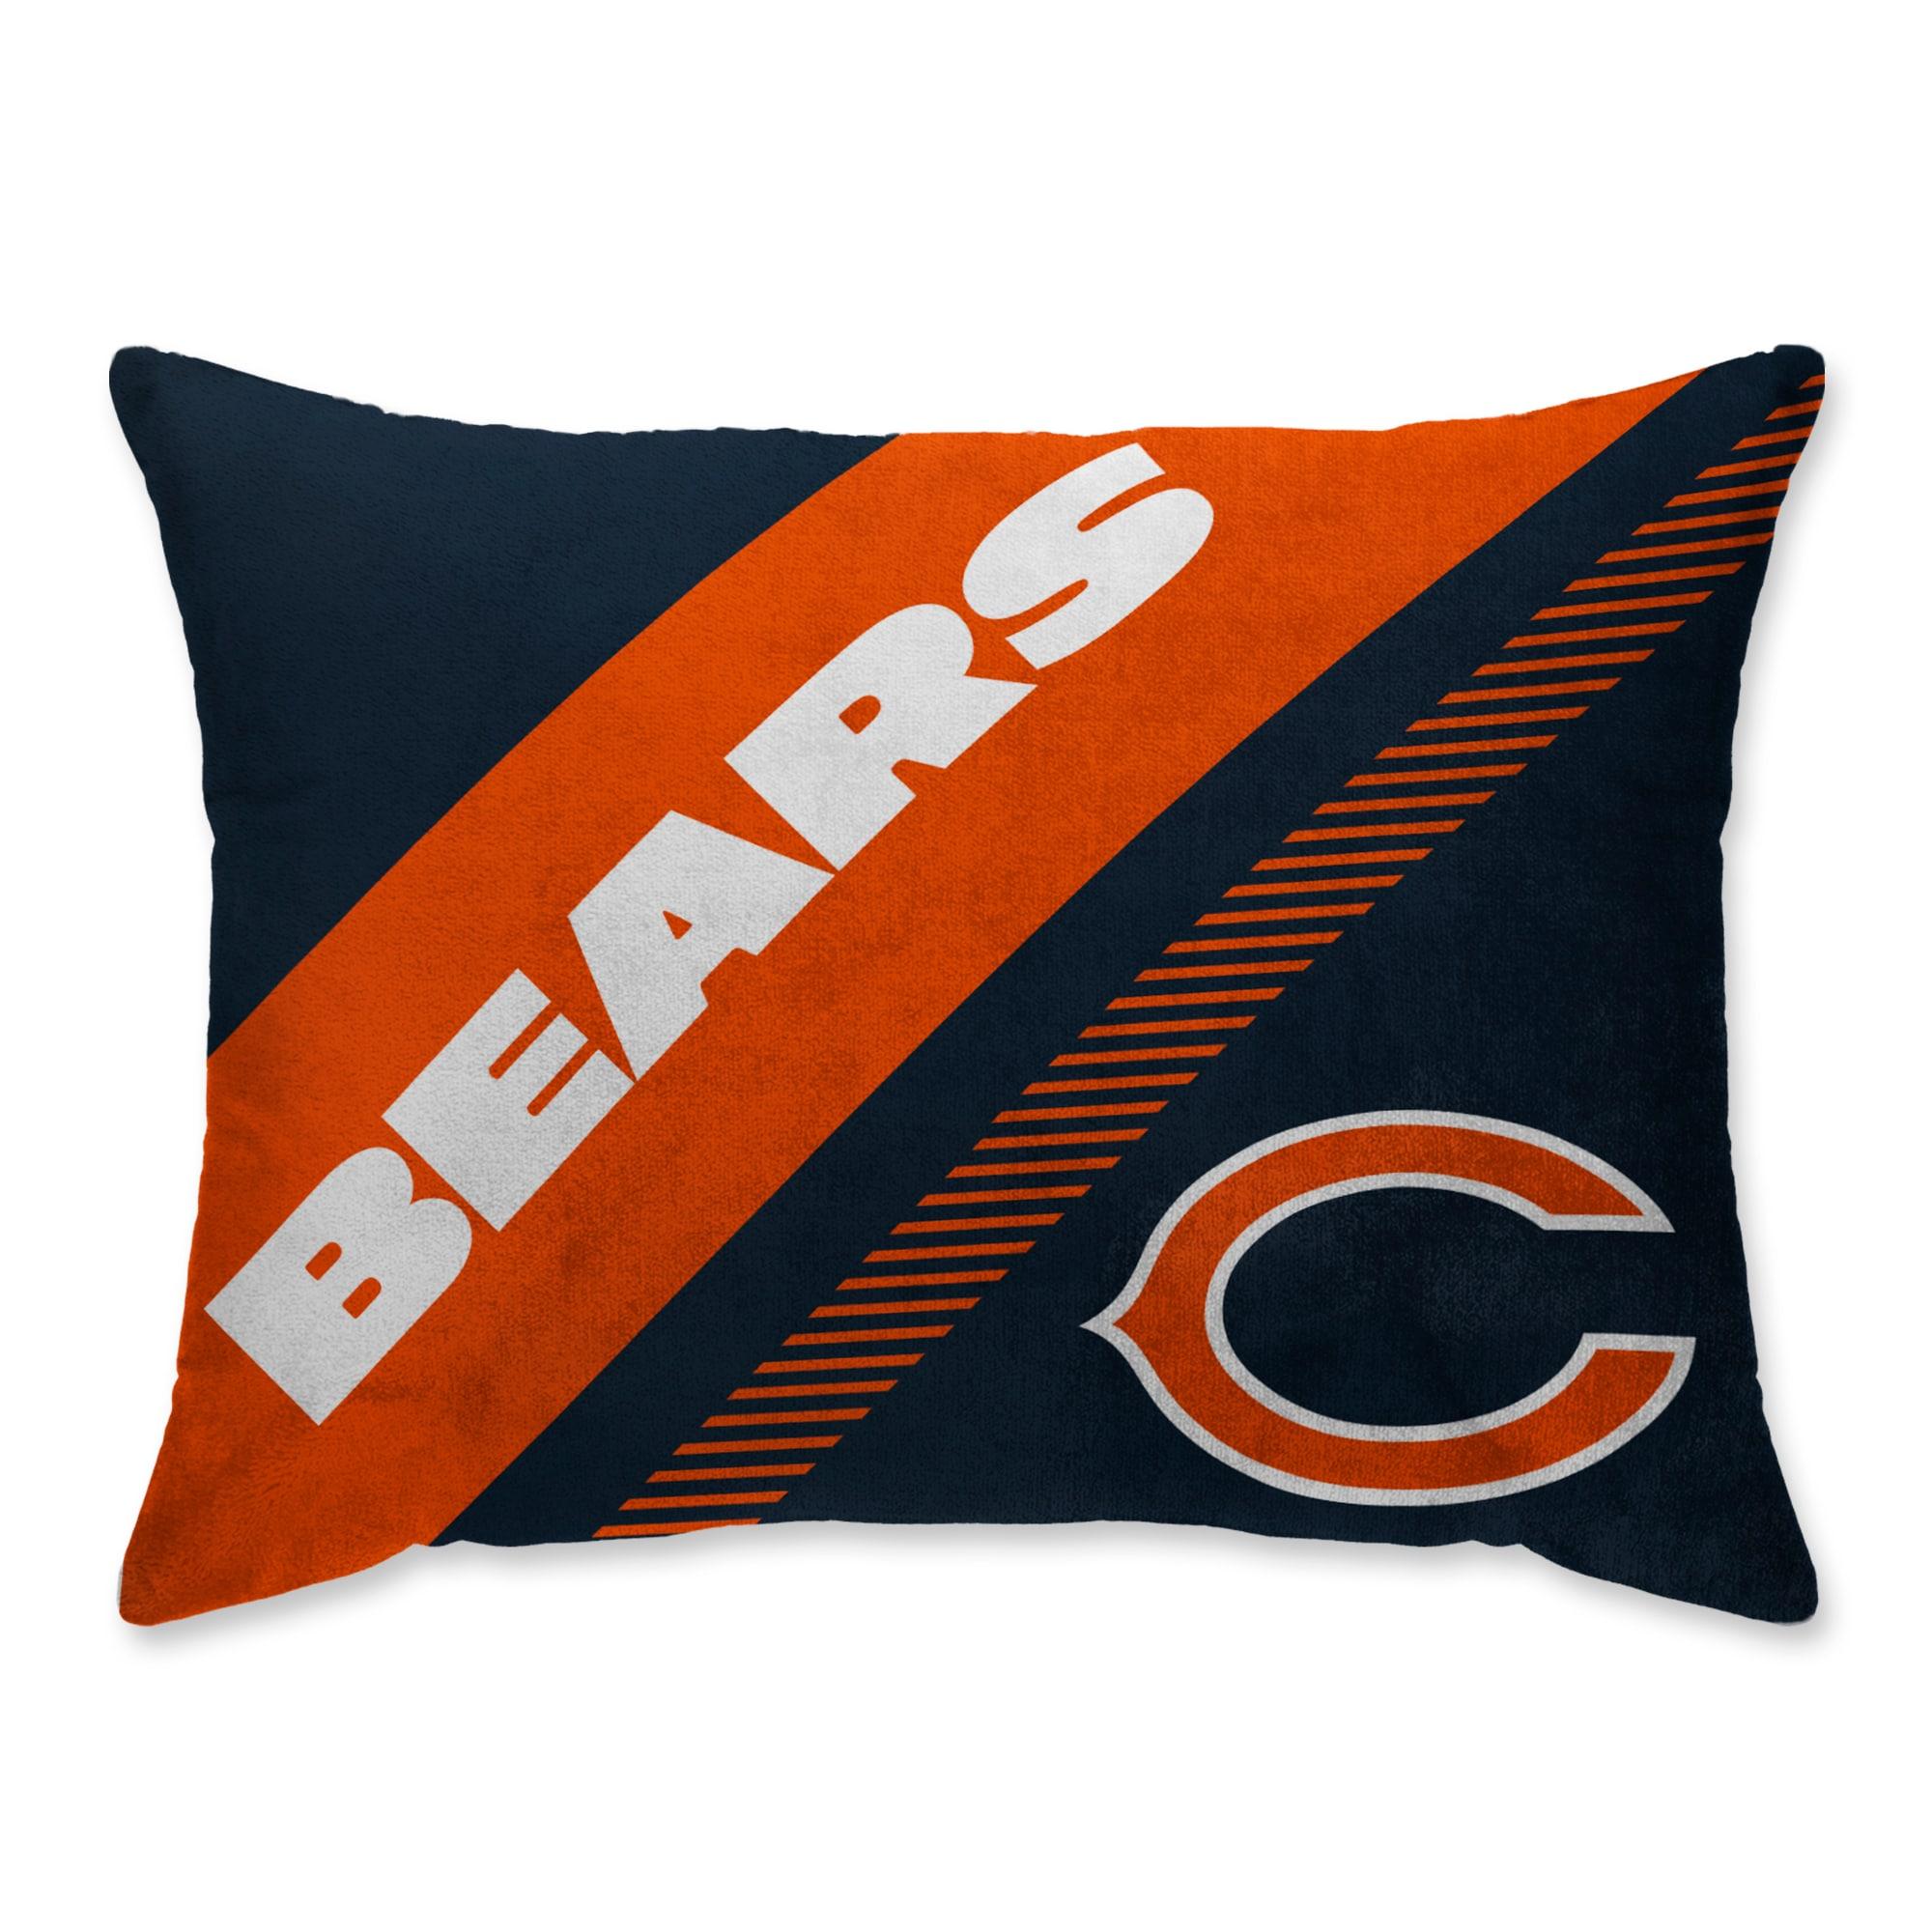 Chicago Bears Super Plush Mink Diagonal Bed Pillow - Blue